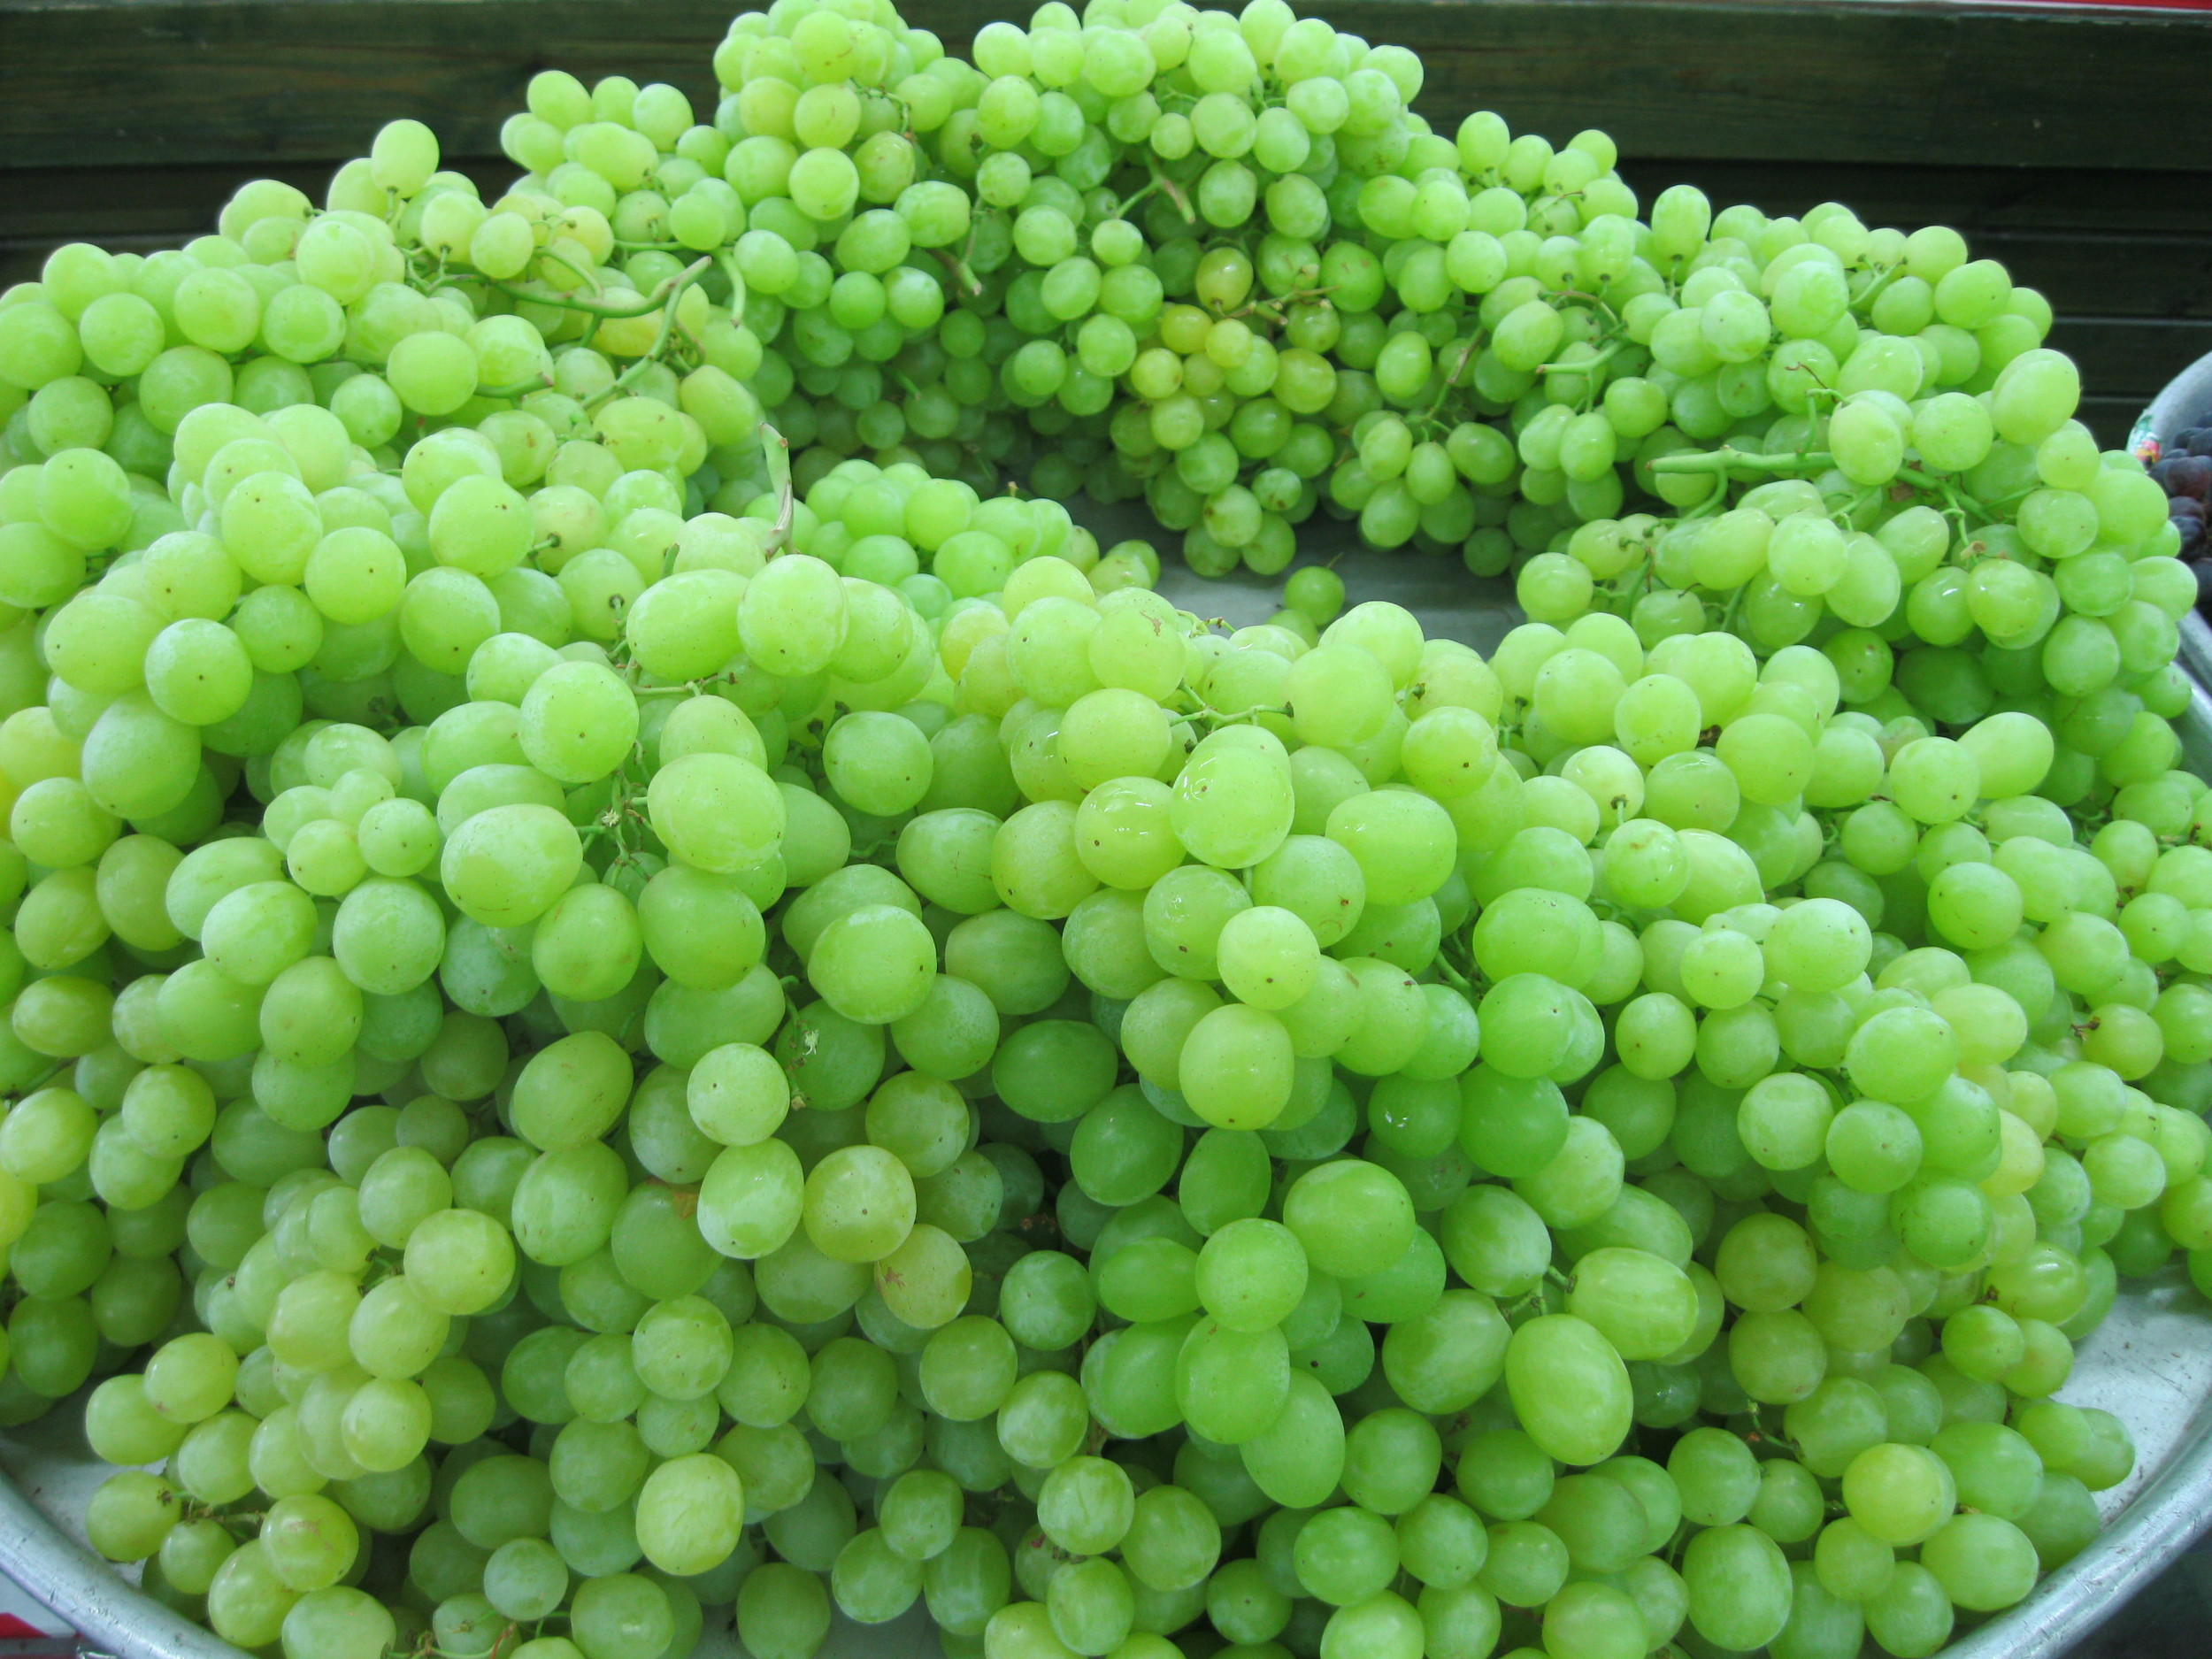 Delicious grapes from Nazareth